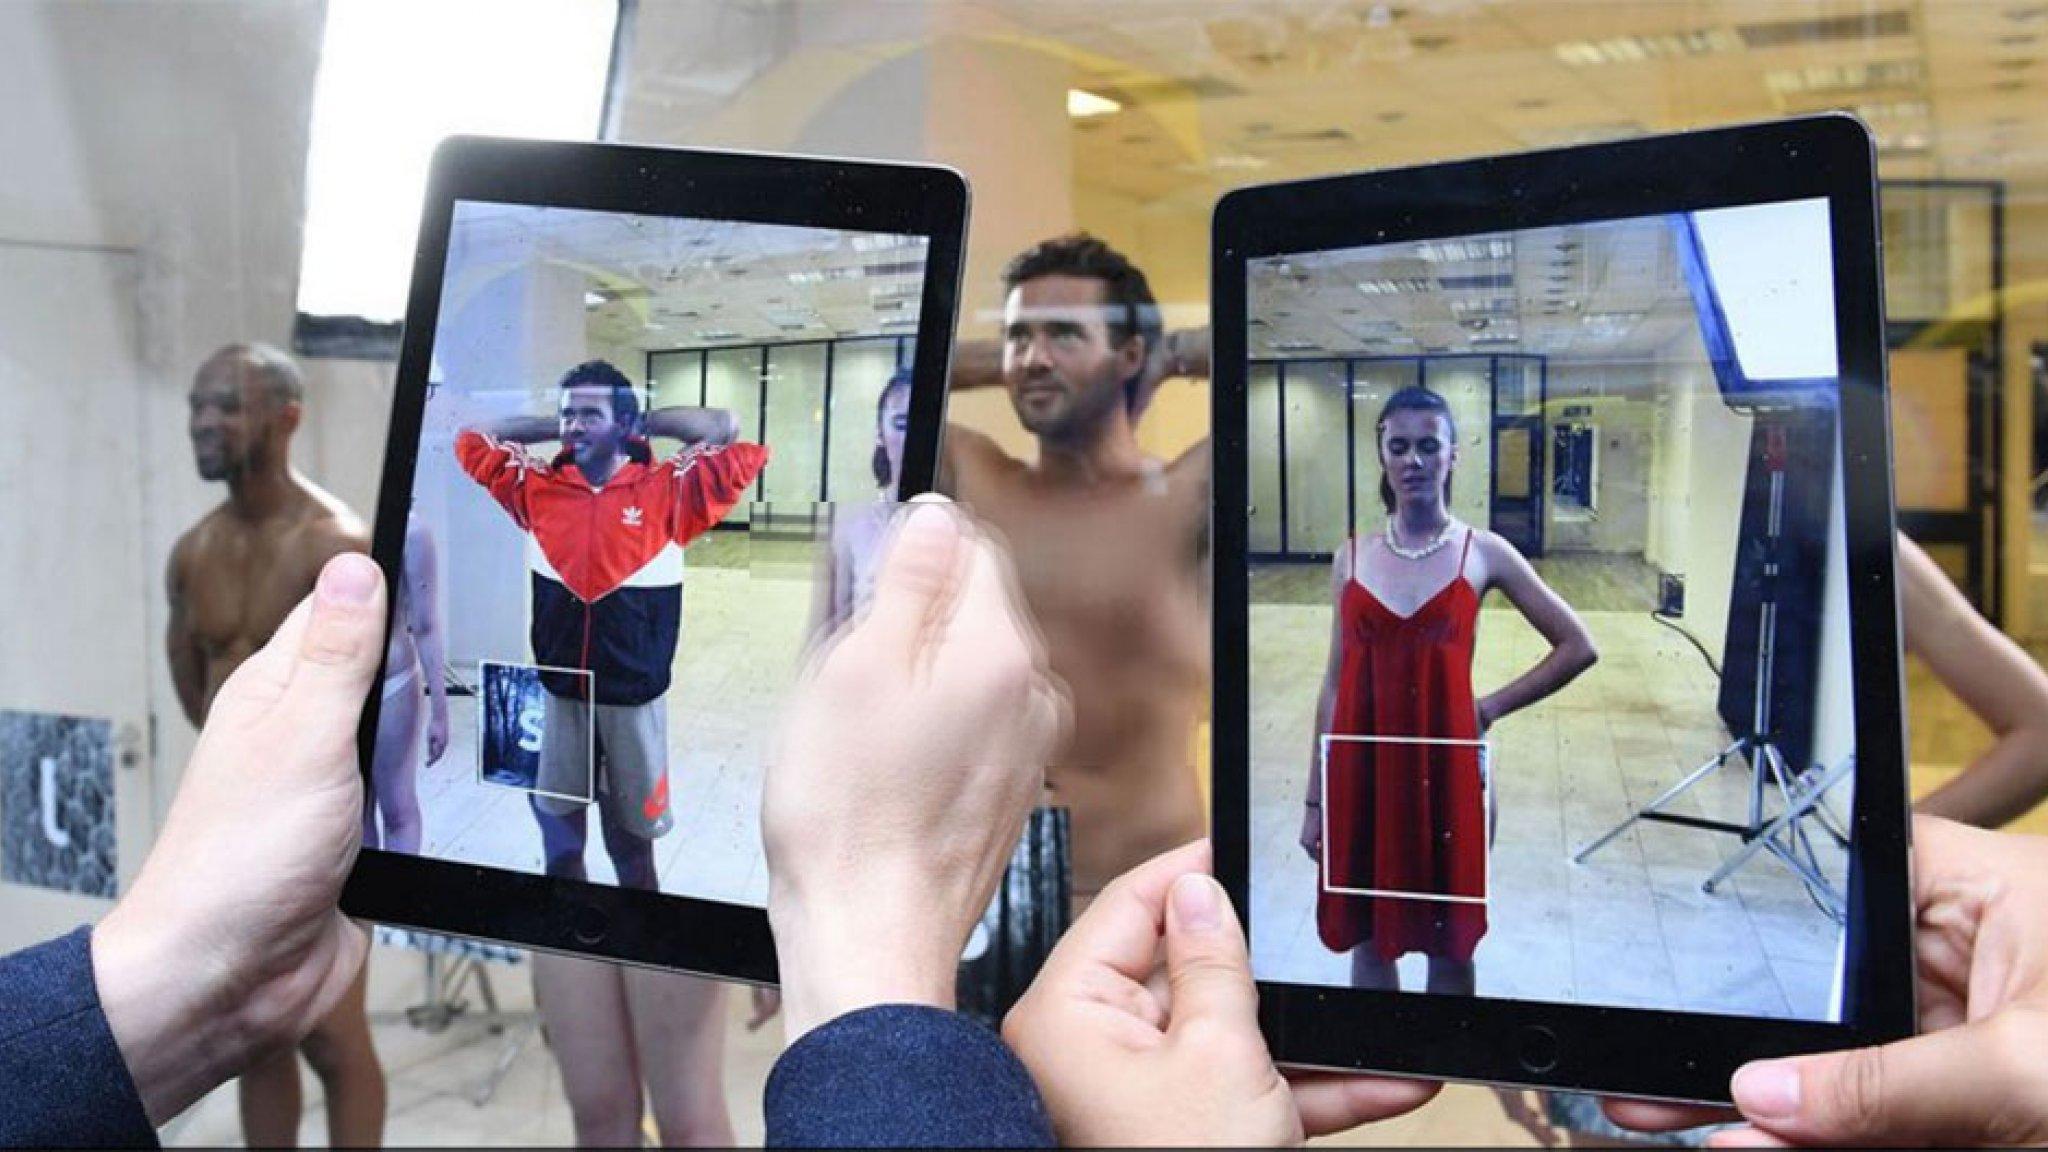 eb5b3eb3b31 Webwinkel kleedt modellen aan met augmented reality | Bright